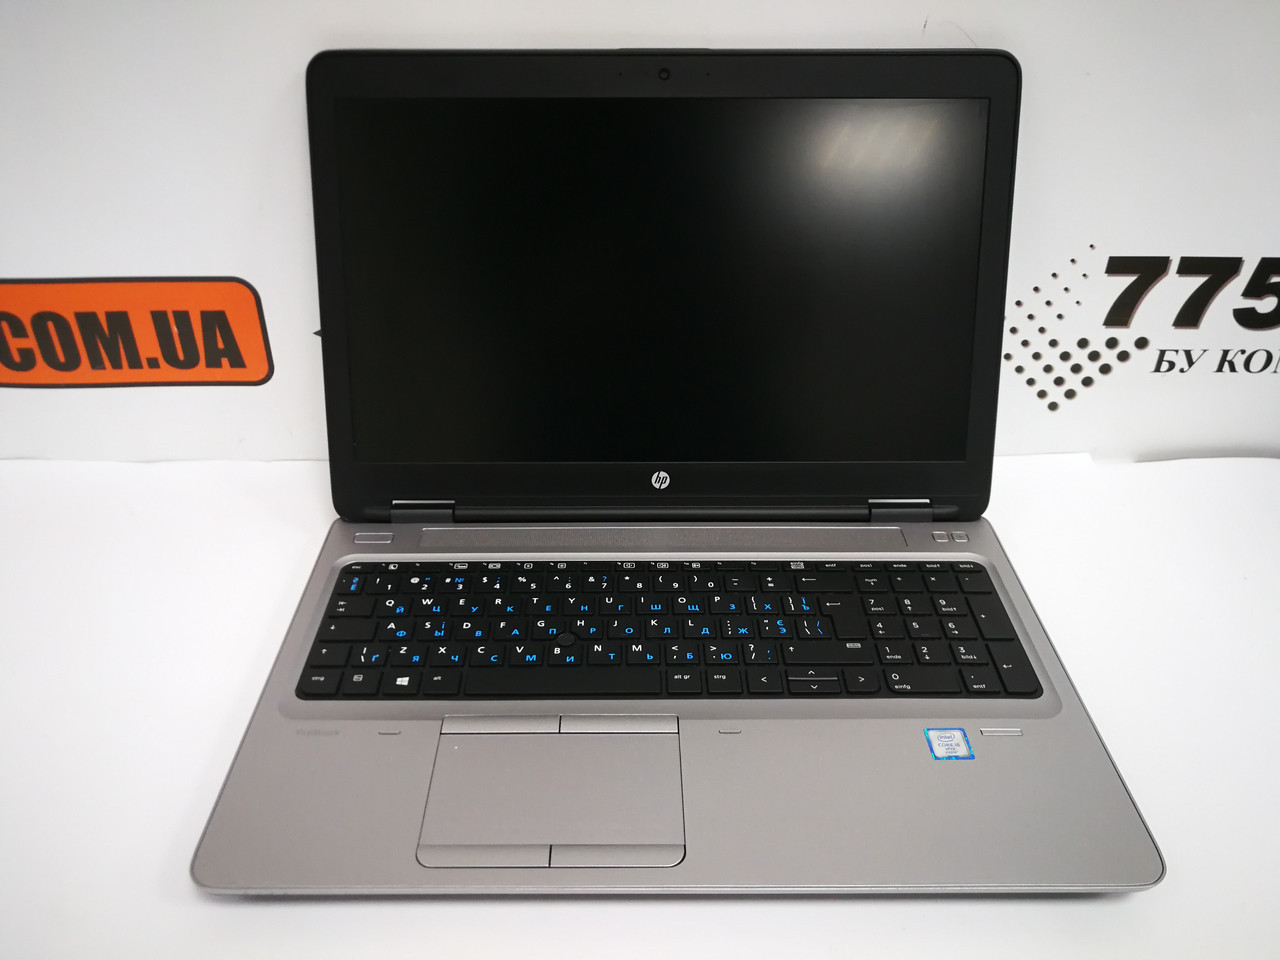 "Ноутбук HP ProBook 650 G2, 15.6"", Intel Core i5-6300U 3.0GHz, DDR4 8ГБ, SSD 240ГБ, Win10 Pro"